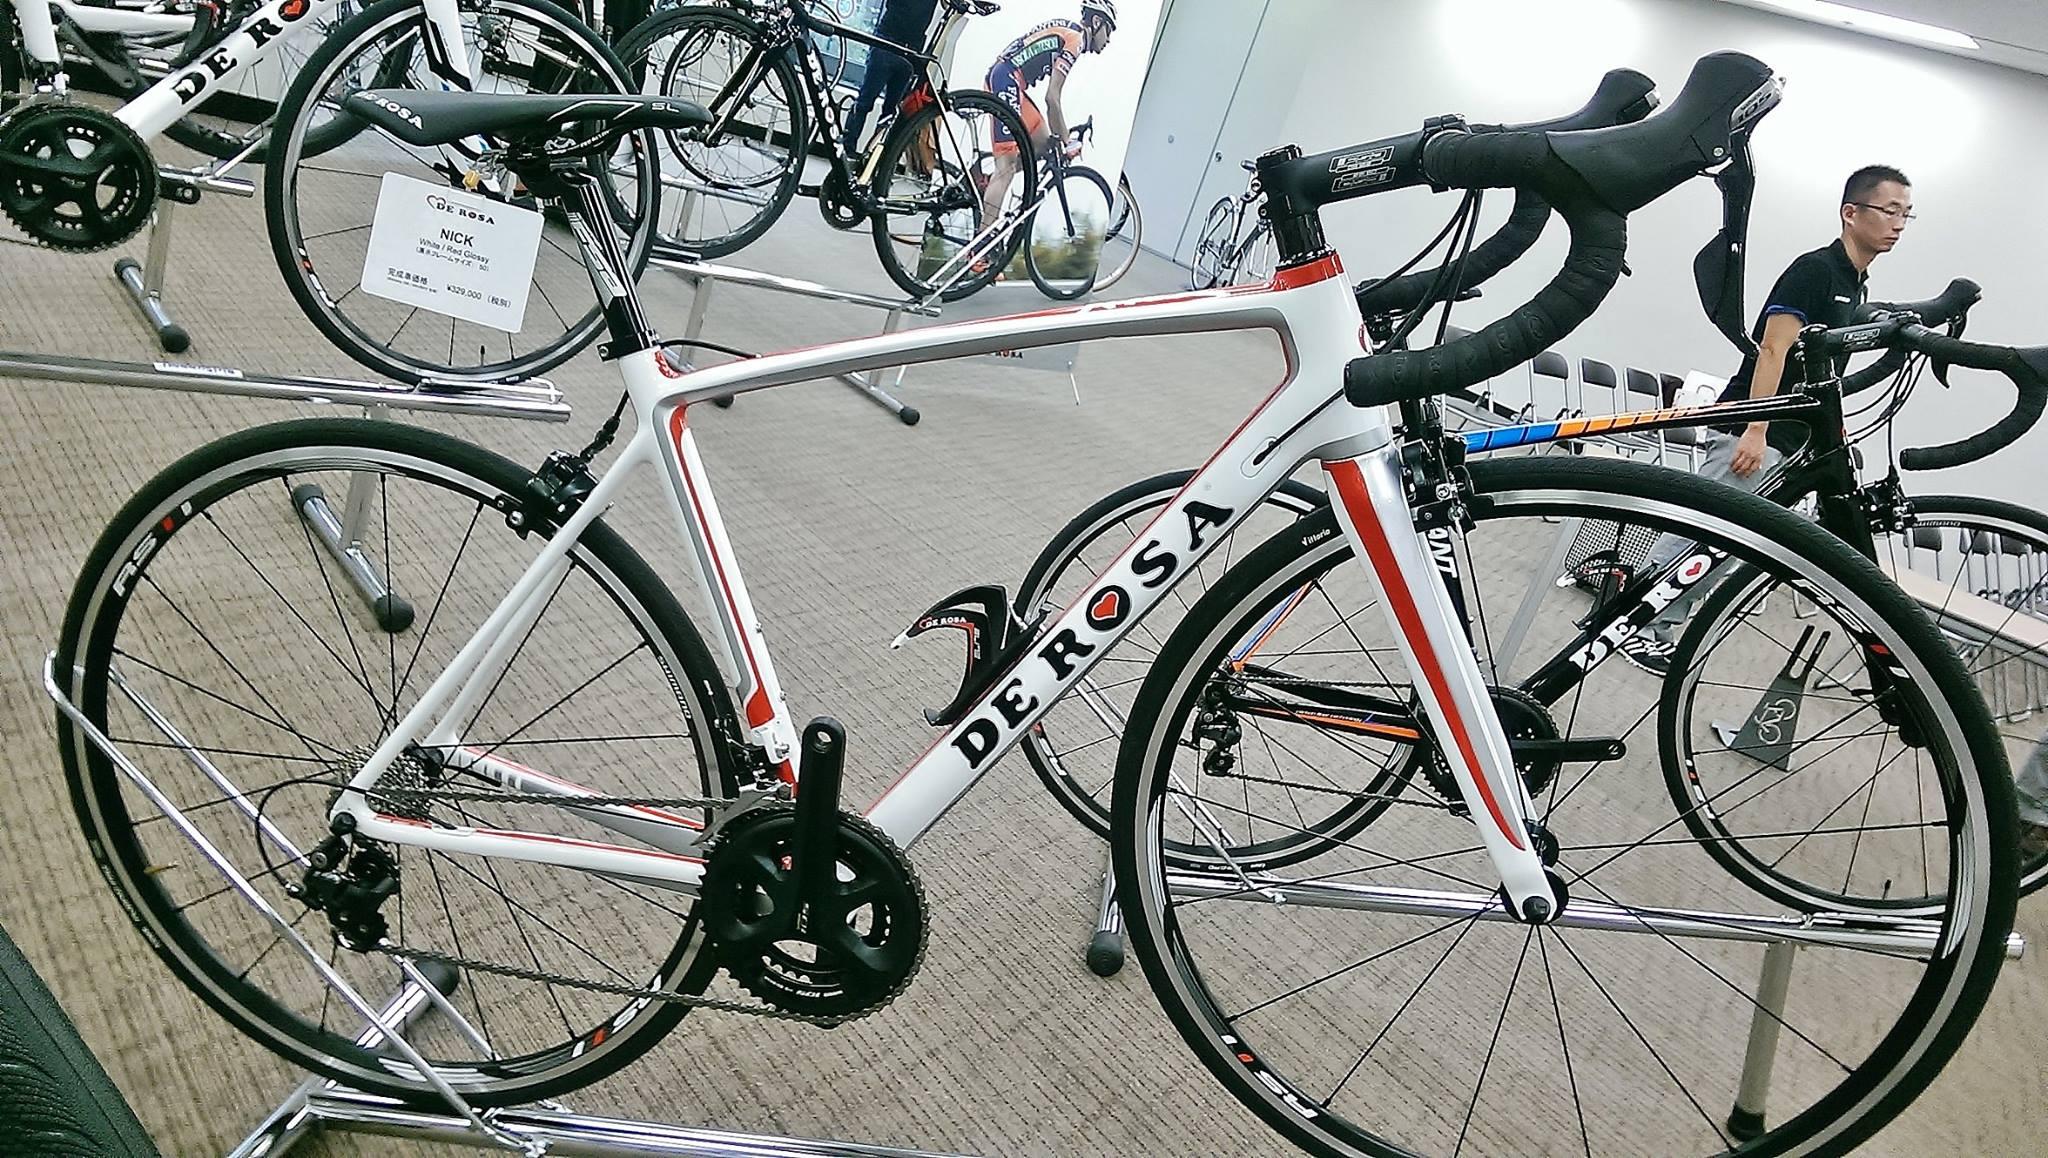 2016 DE ROSA 展示会 デ ローザ イタリアブランド Nick ニック フルカーボン 完成車 サイクリング ロングライド レース 広島県福山市